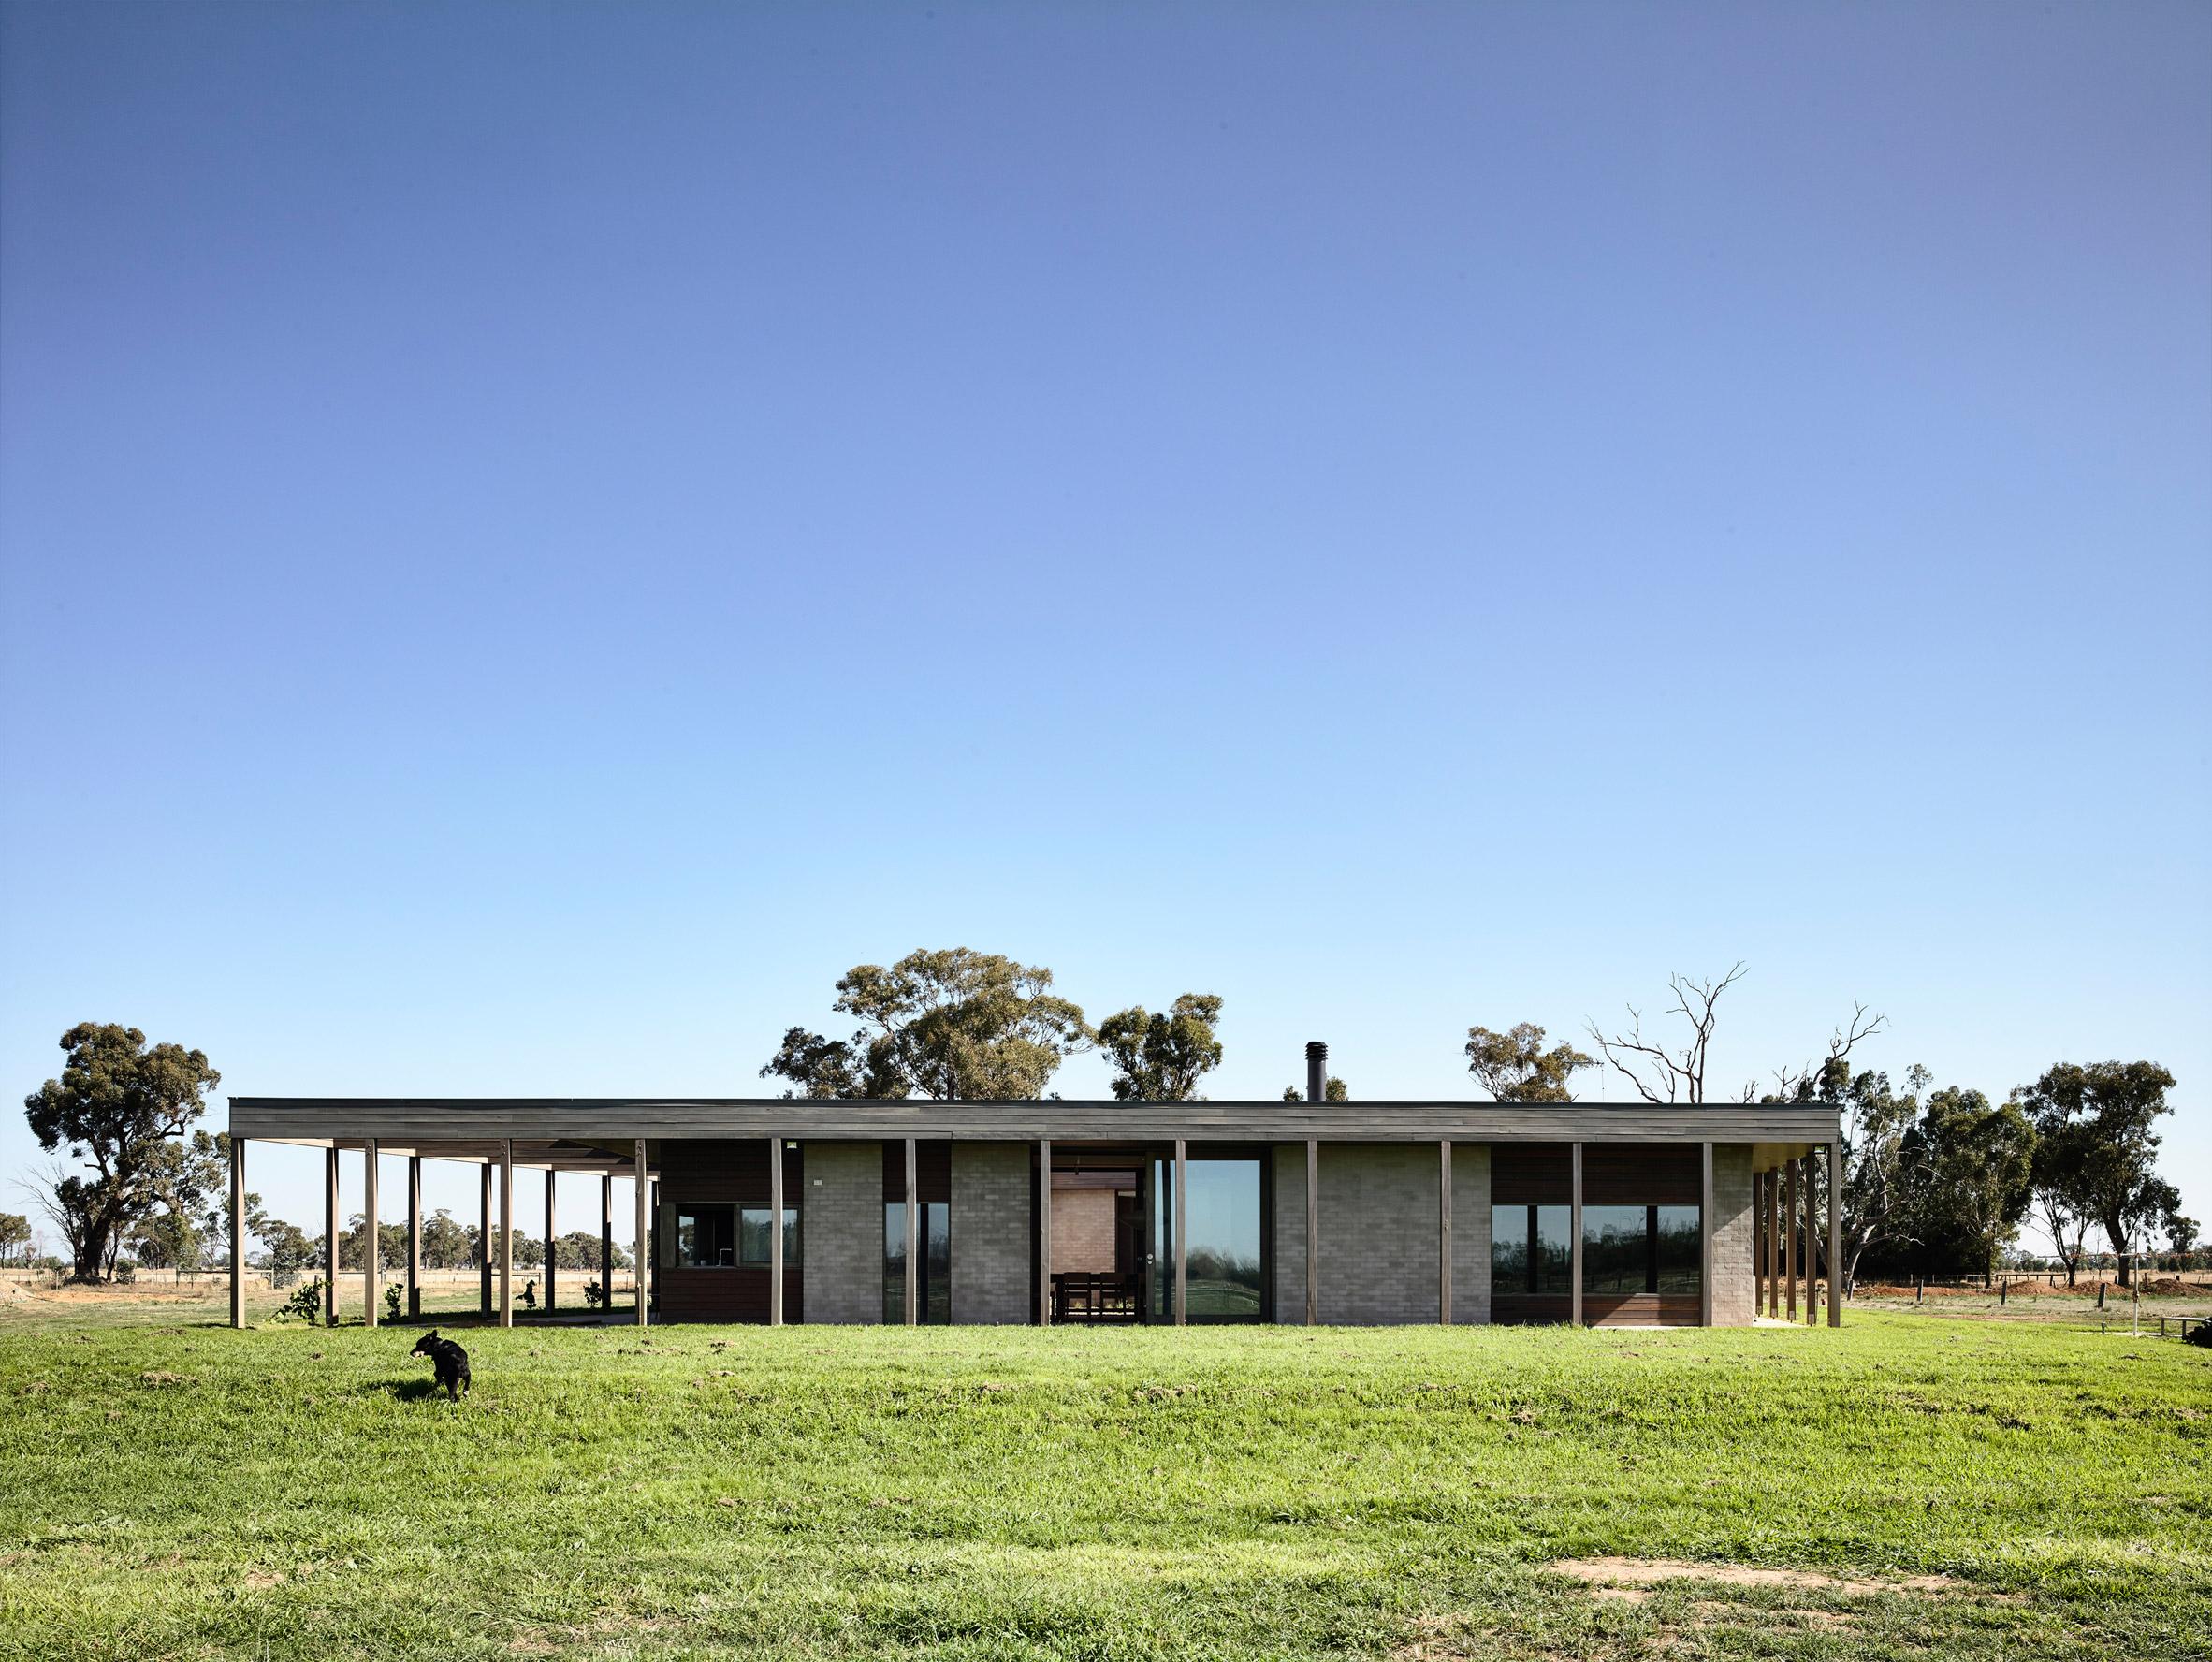 It's located in a farm district in the north of Australia